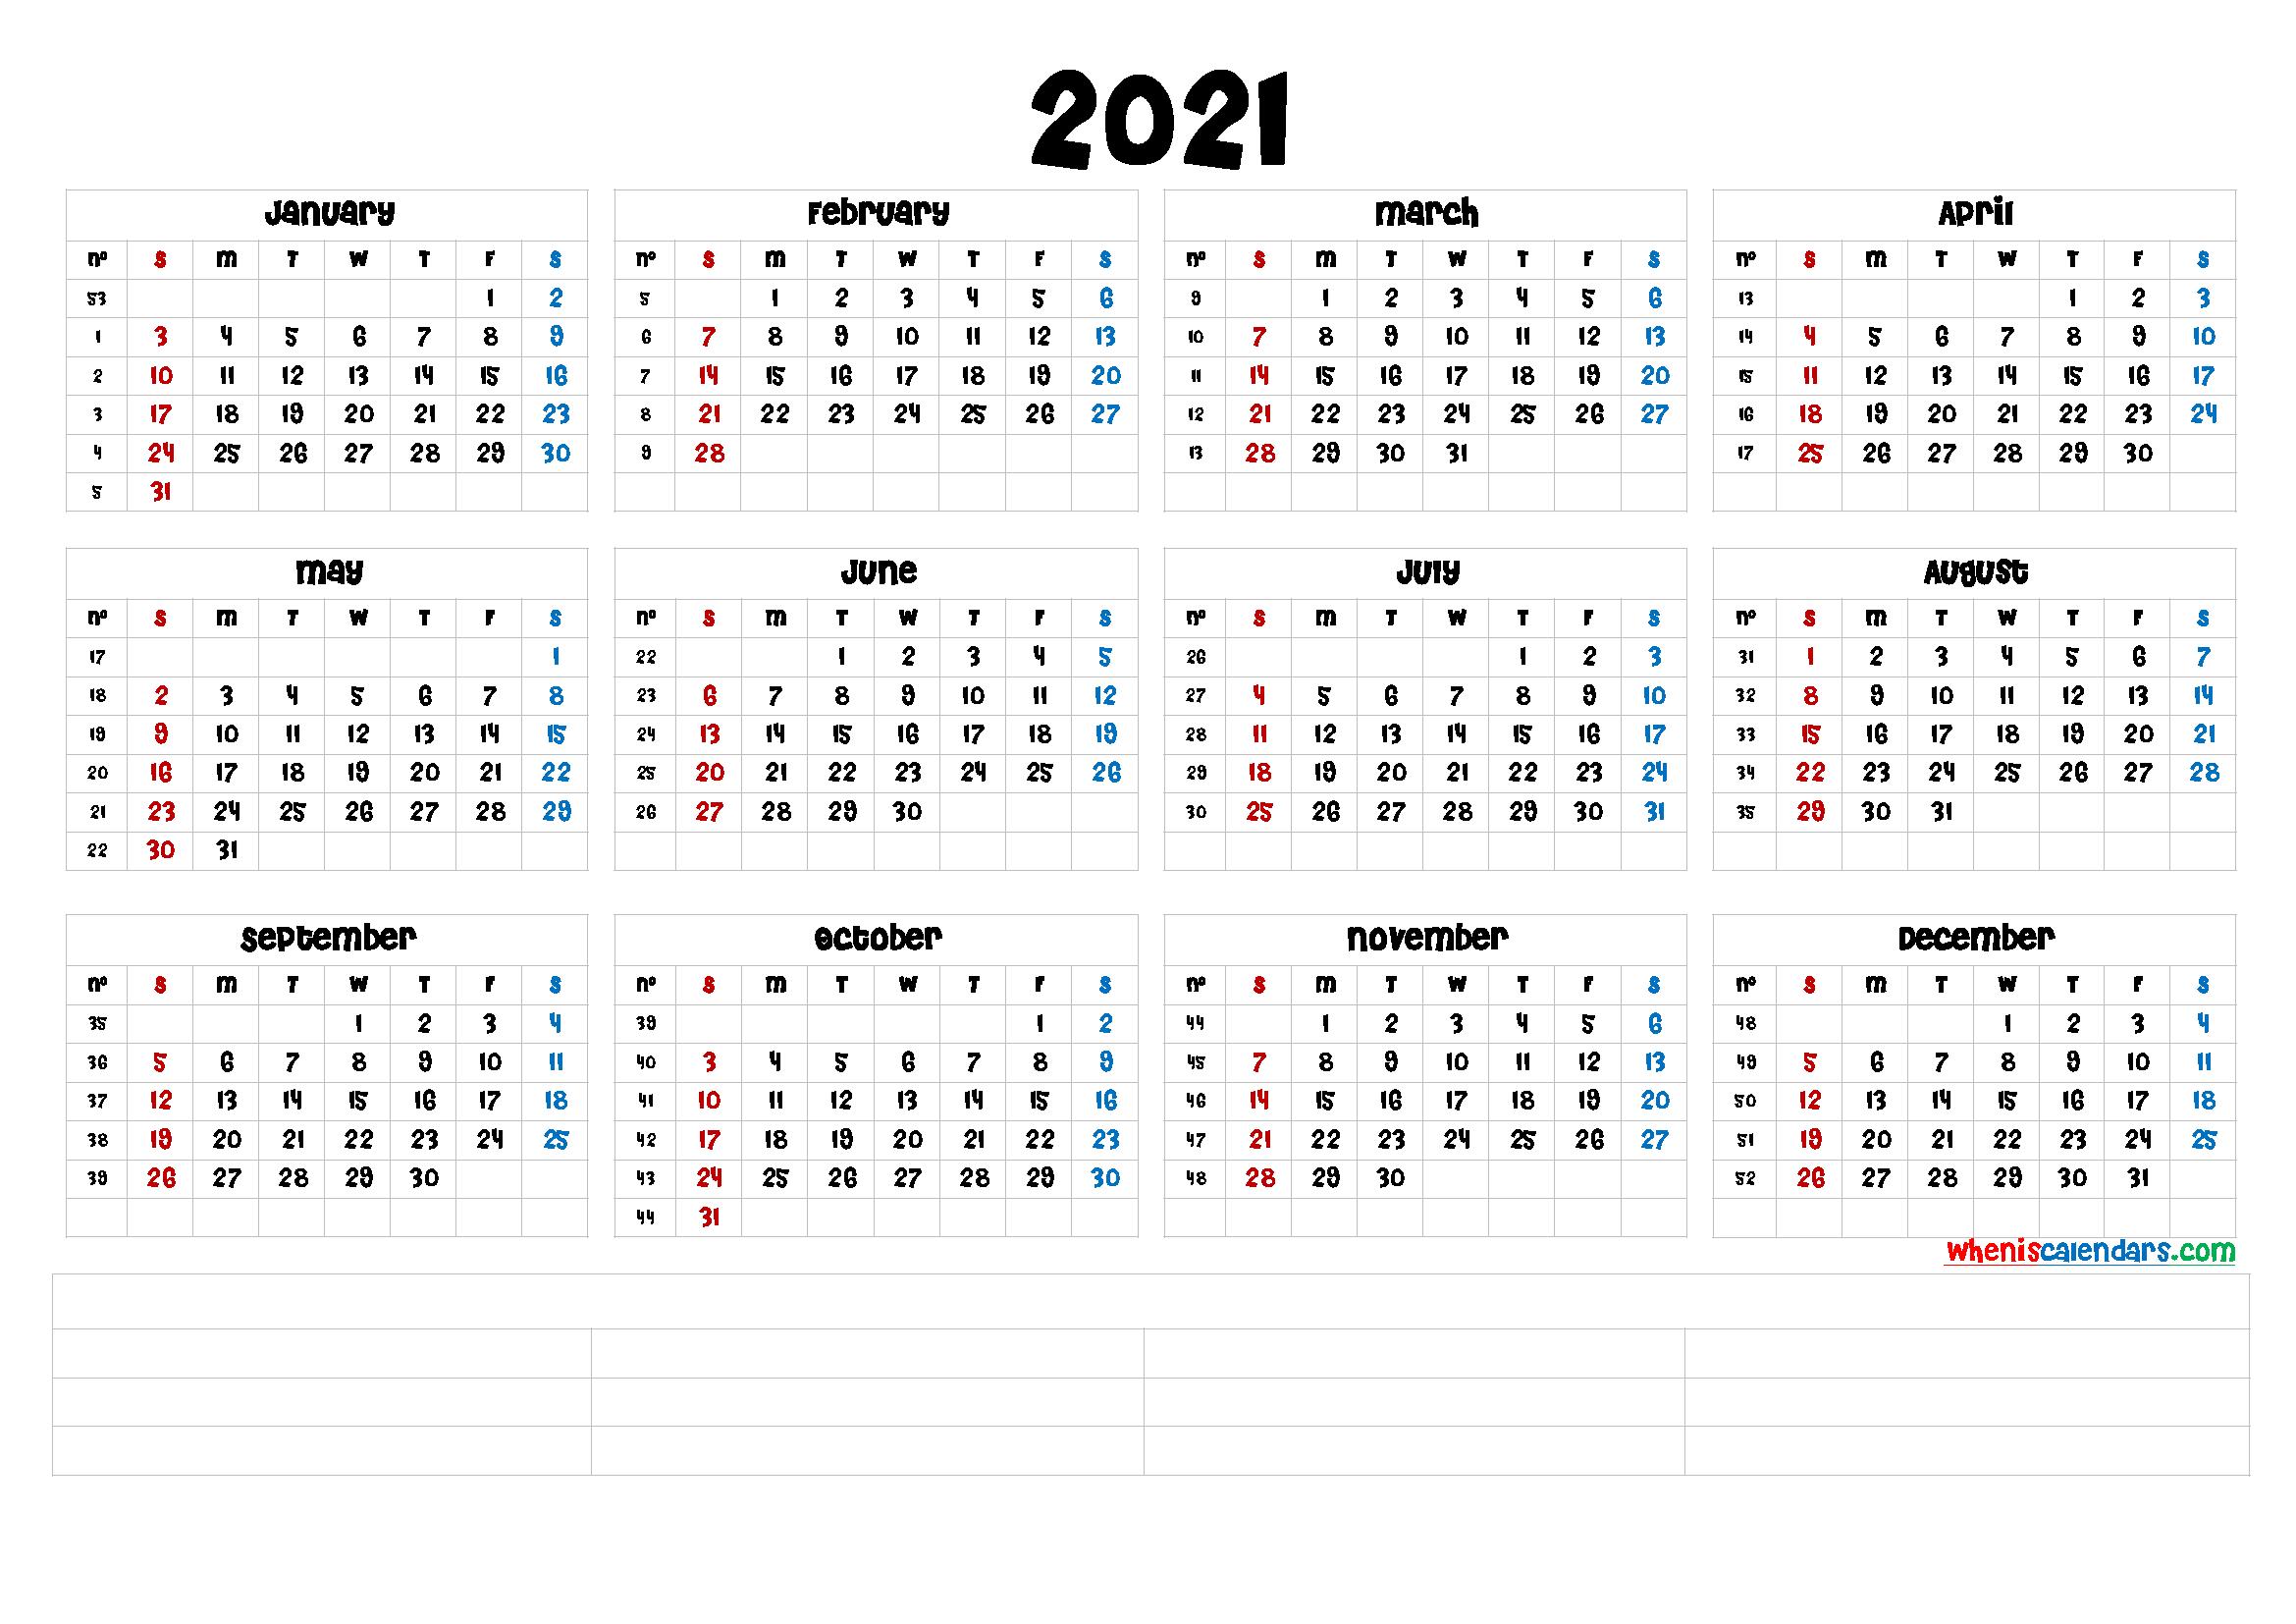 Free Printable 2021 Calendar by Year [Premium Templates